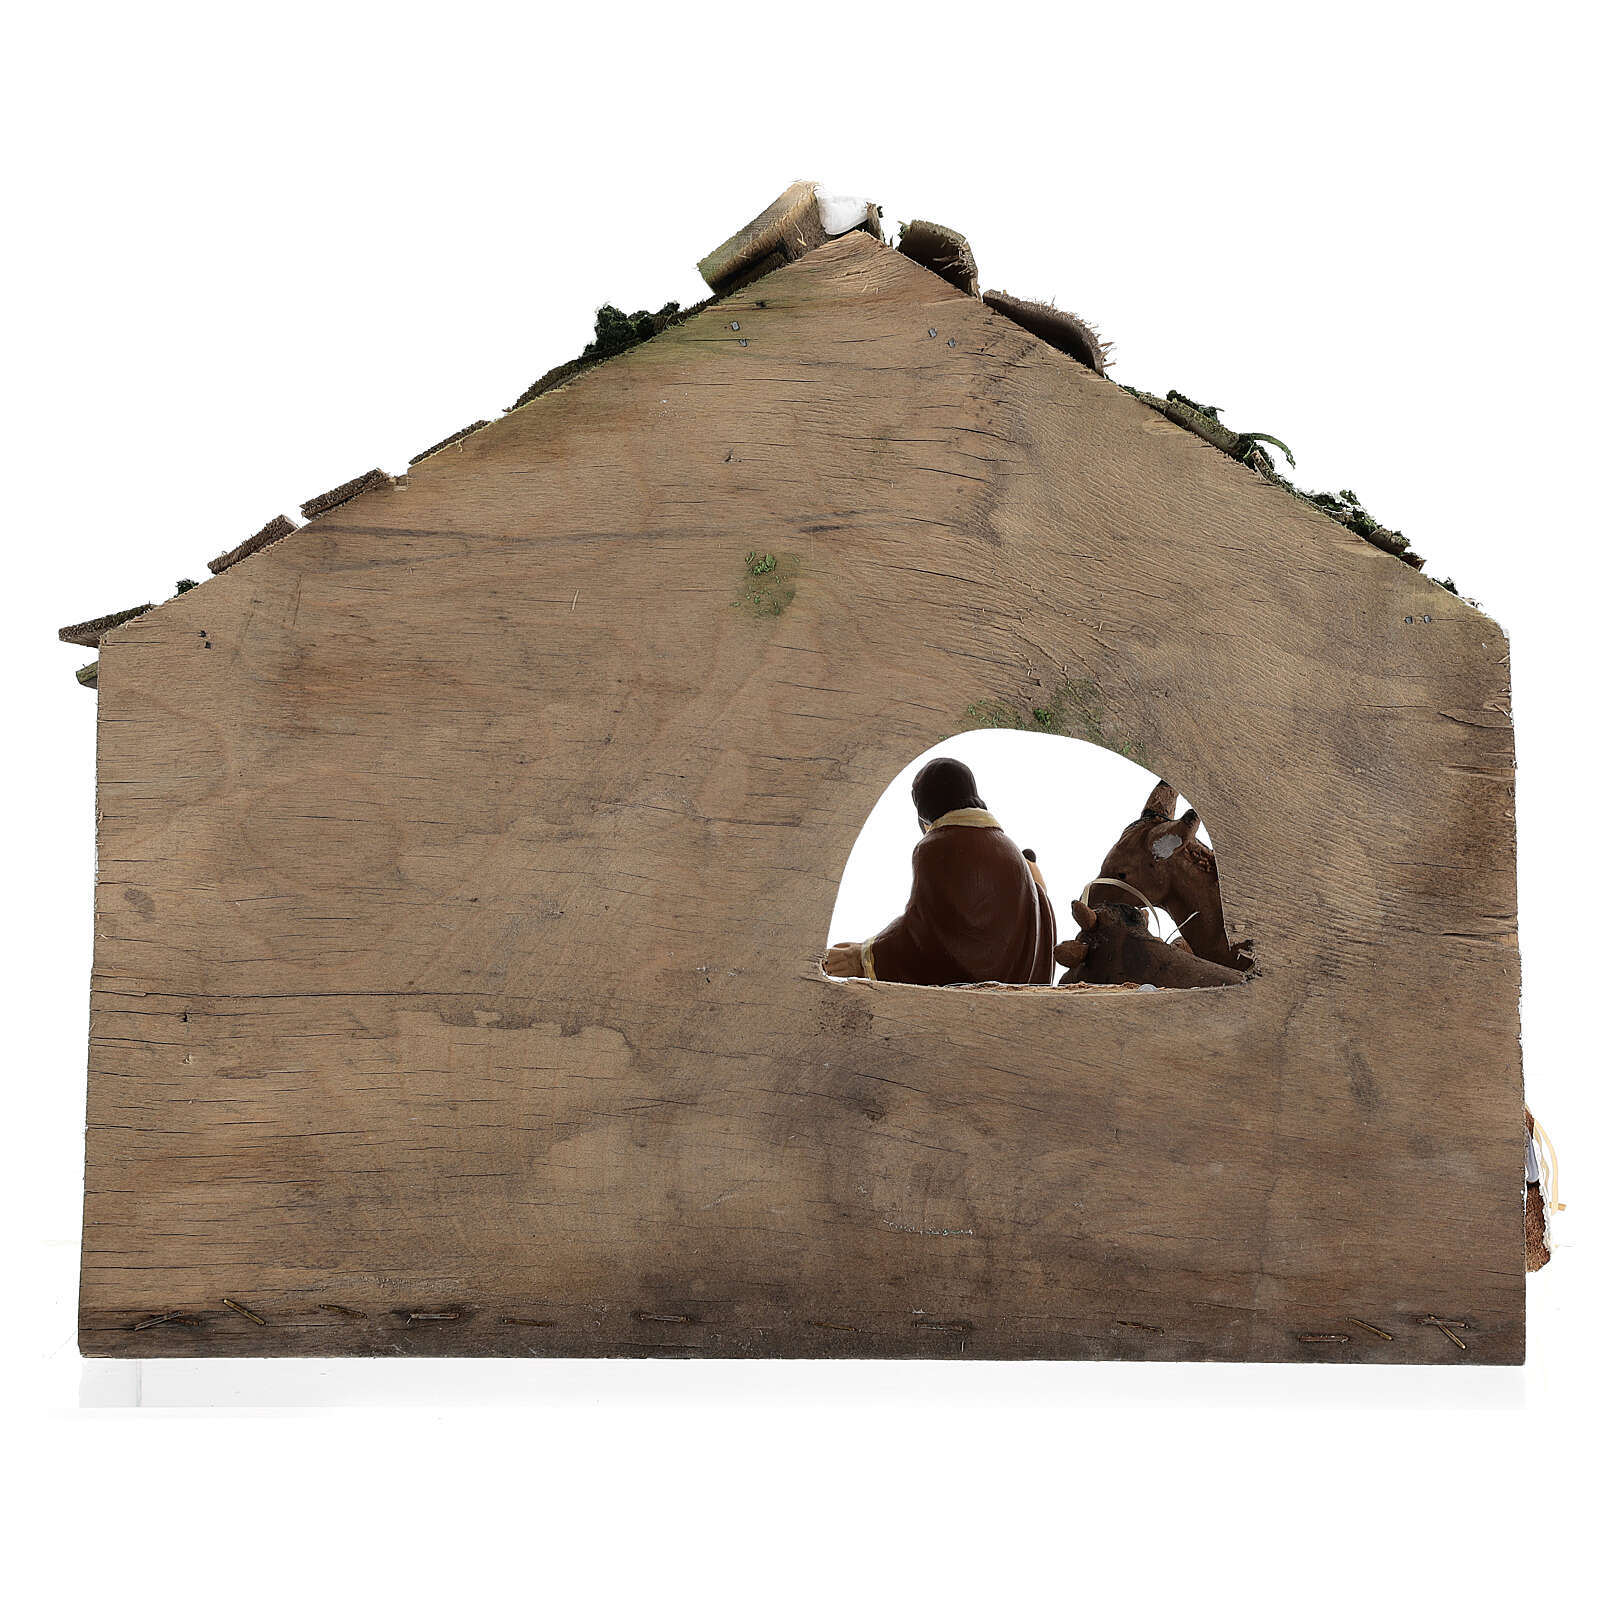 Cabaña madera estatuas terracota pintadas 12 cm Deruta 30x35x20 cm 4